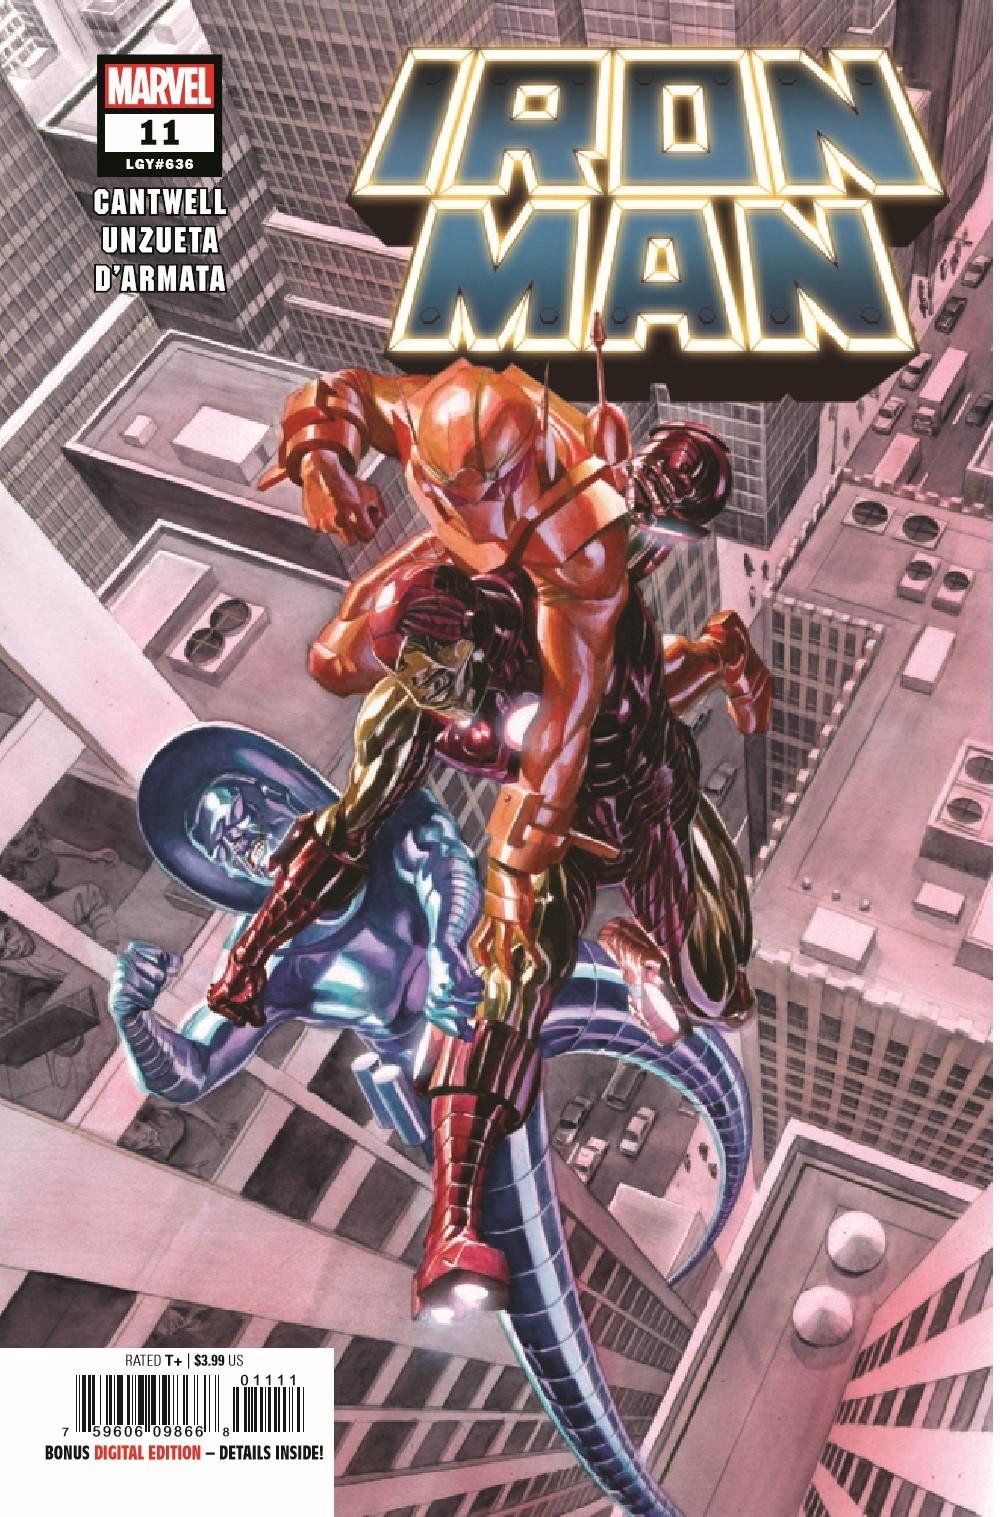 IM2020011_Preview-1 ComicList Previews: IRON MAN #11